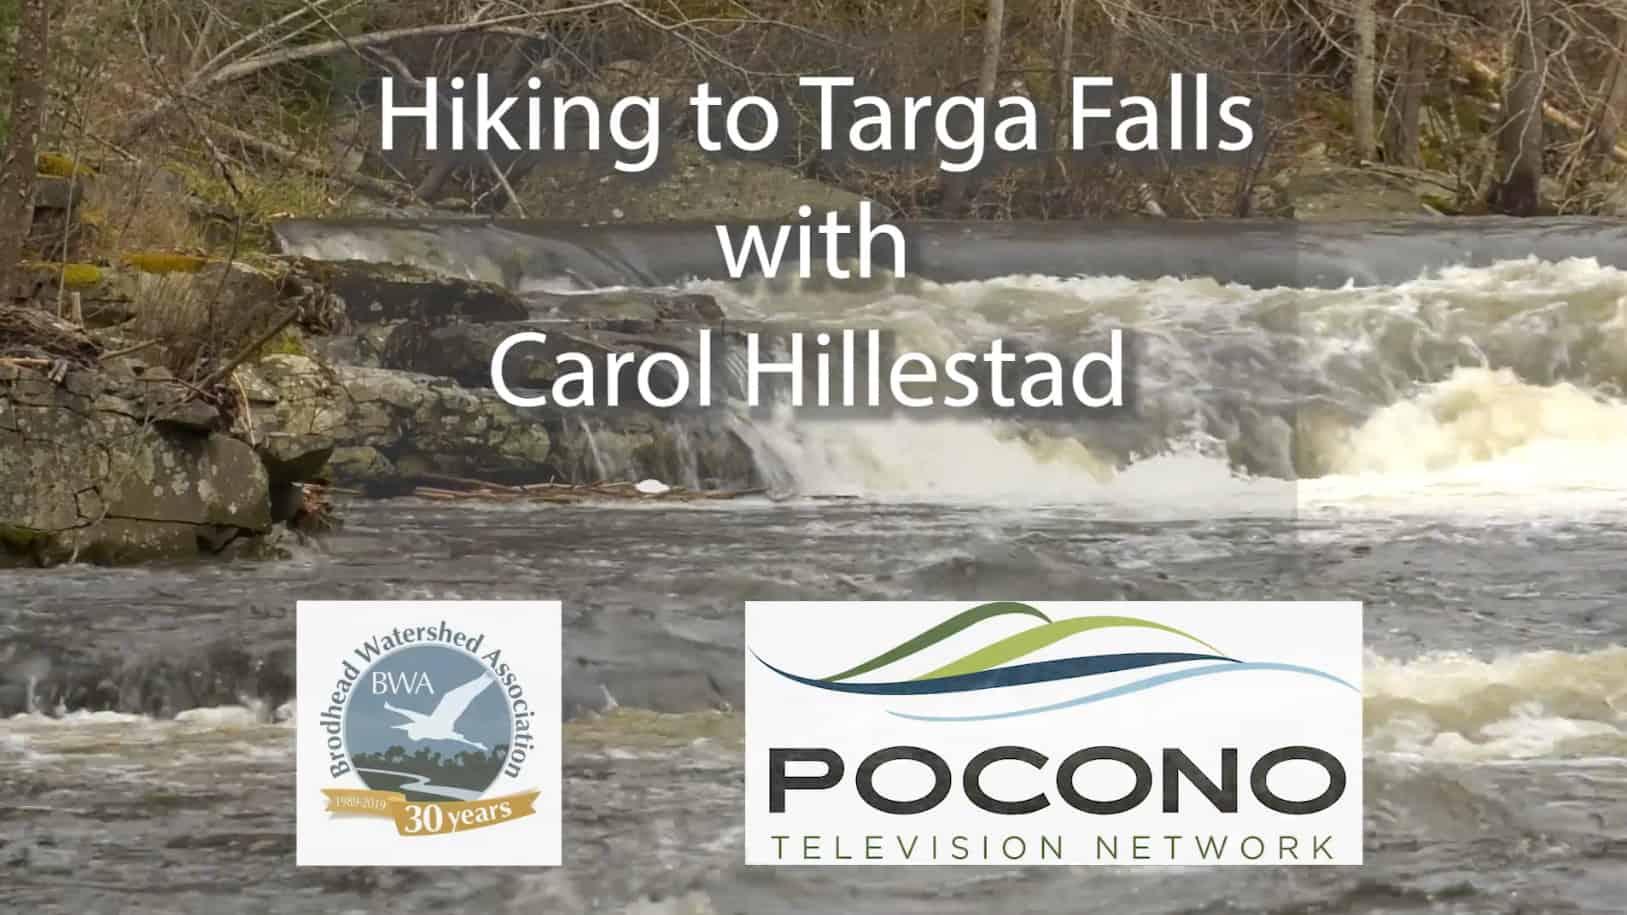 Targa Falls video